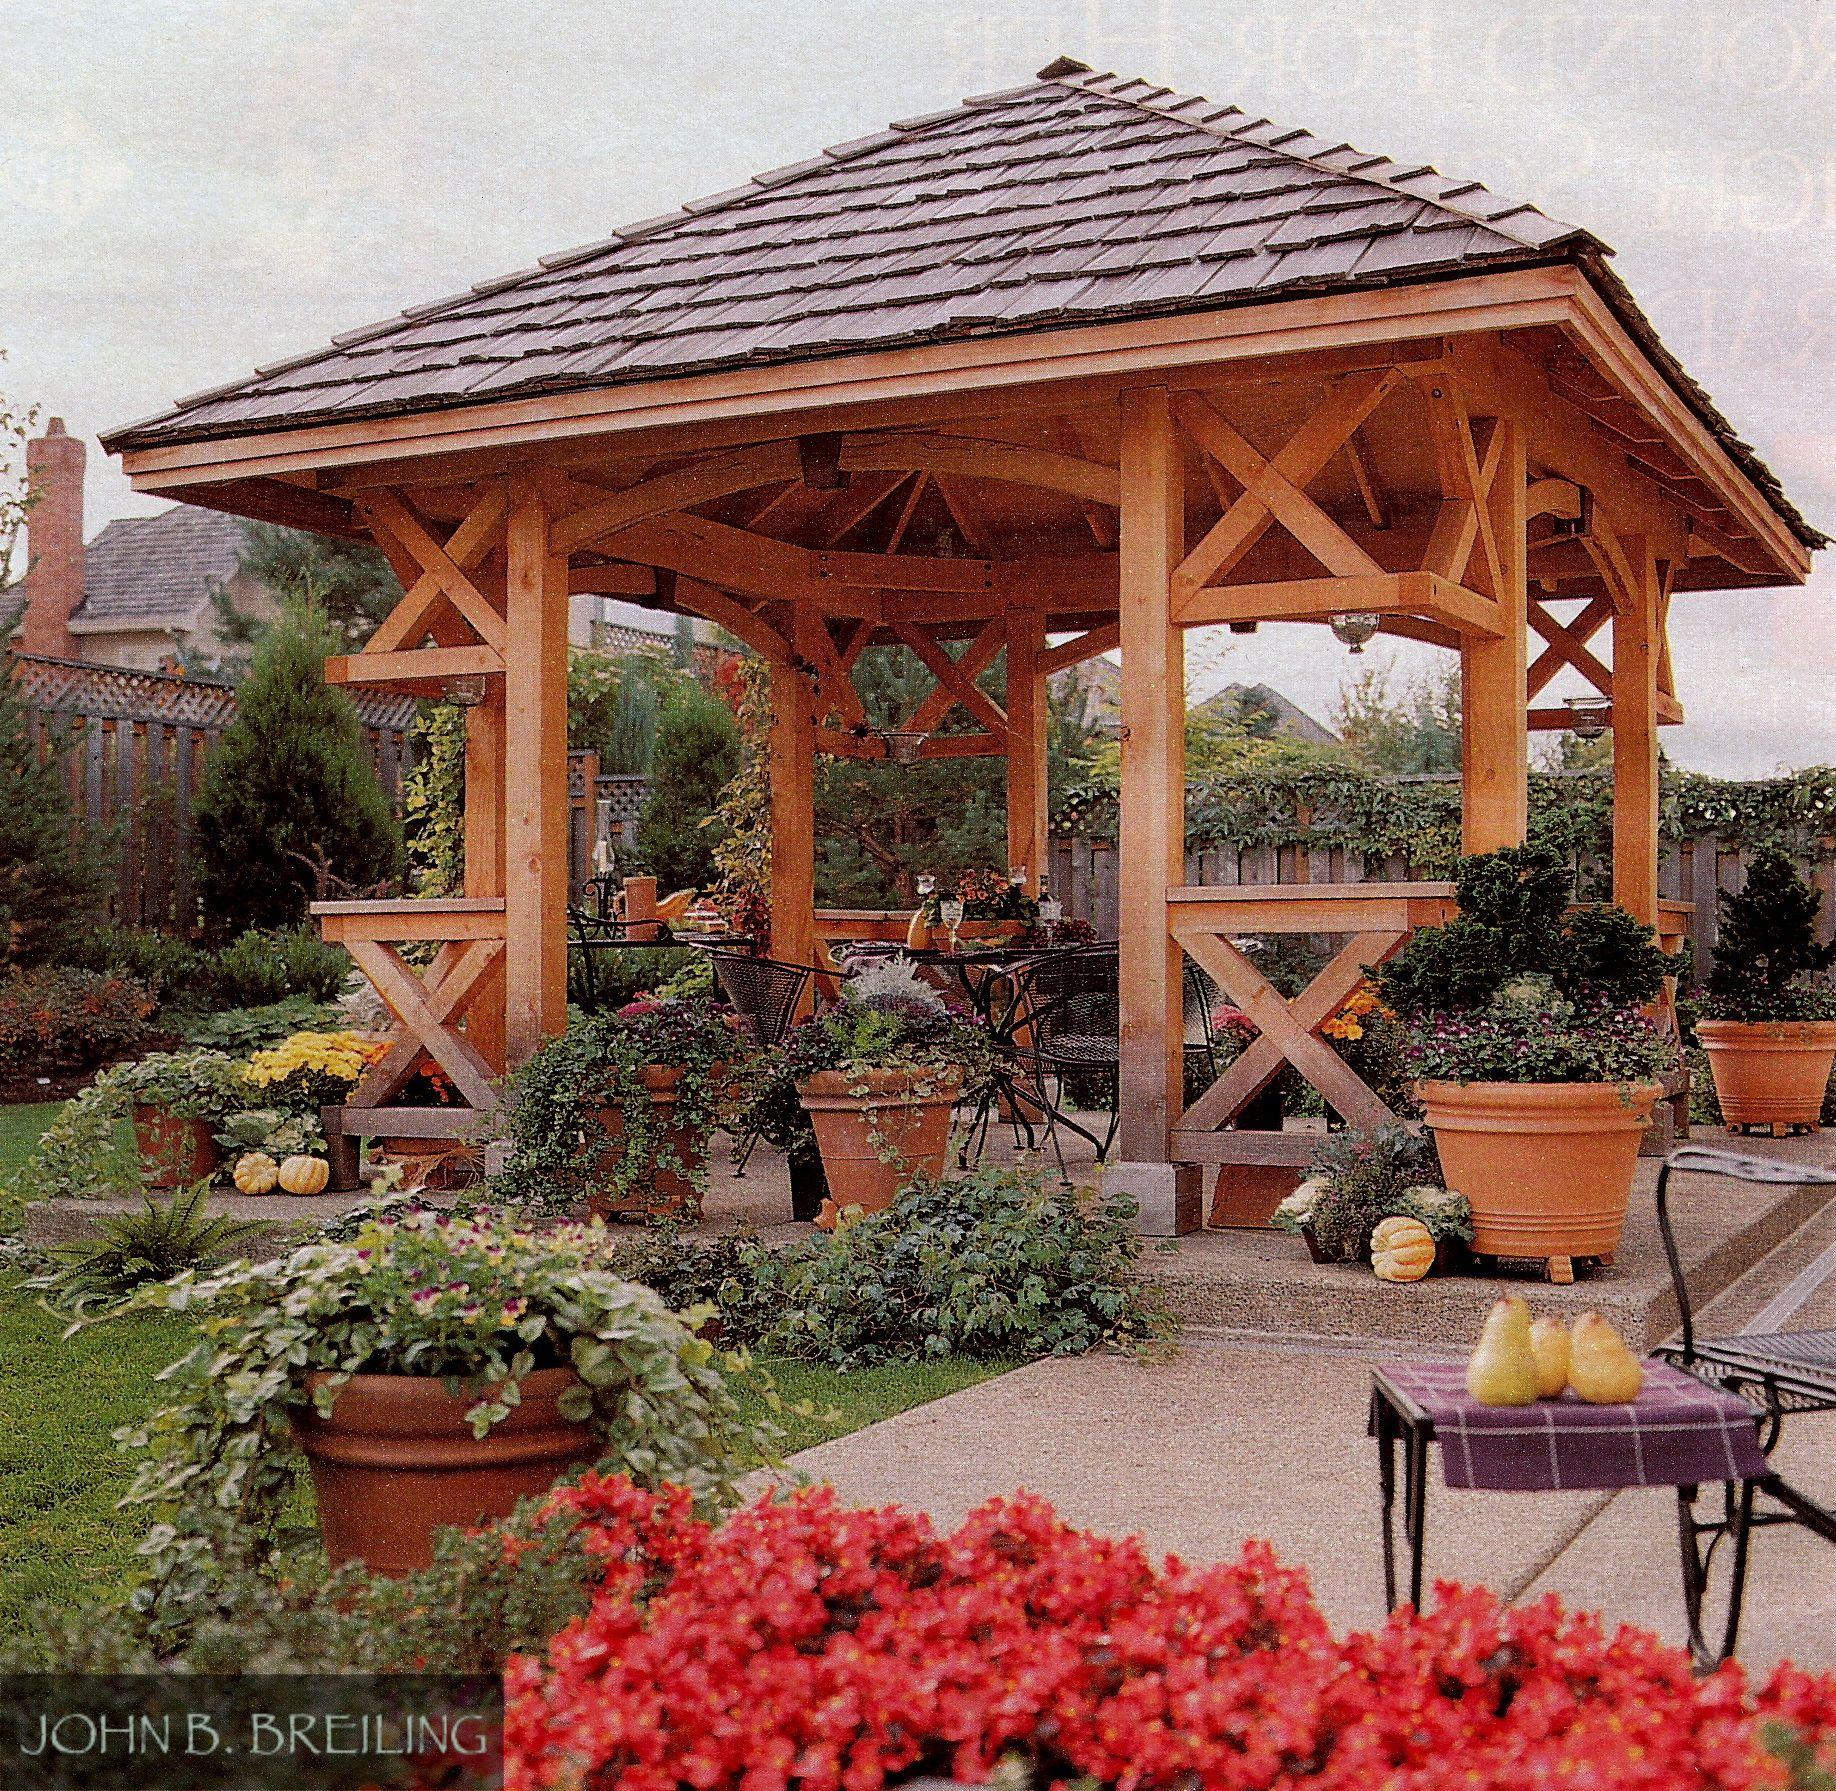 Delightful Outdoor Dining Gazebo / Pavillion In Cedar Mill Oregon, By John Breiling  Deckop.com